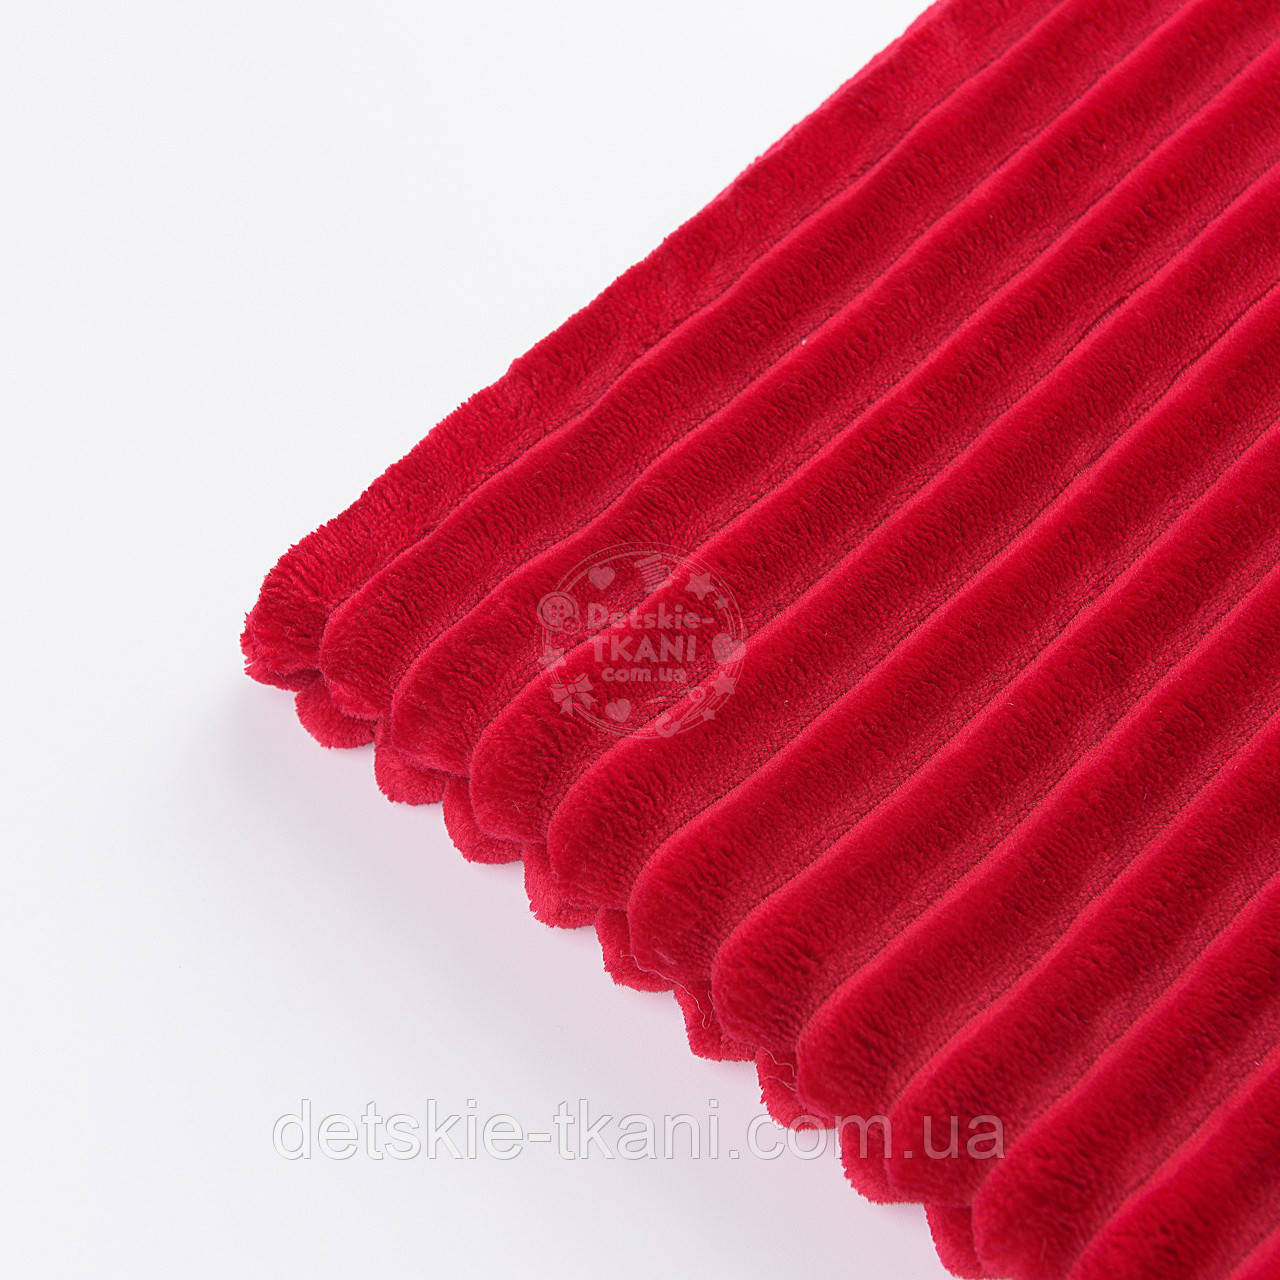 Отрез плюша в полоску Stripes вишневого цвета 60*165 см